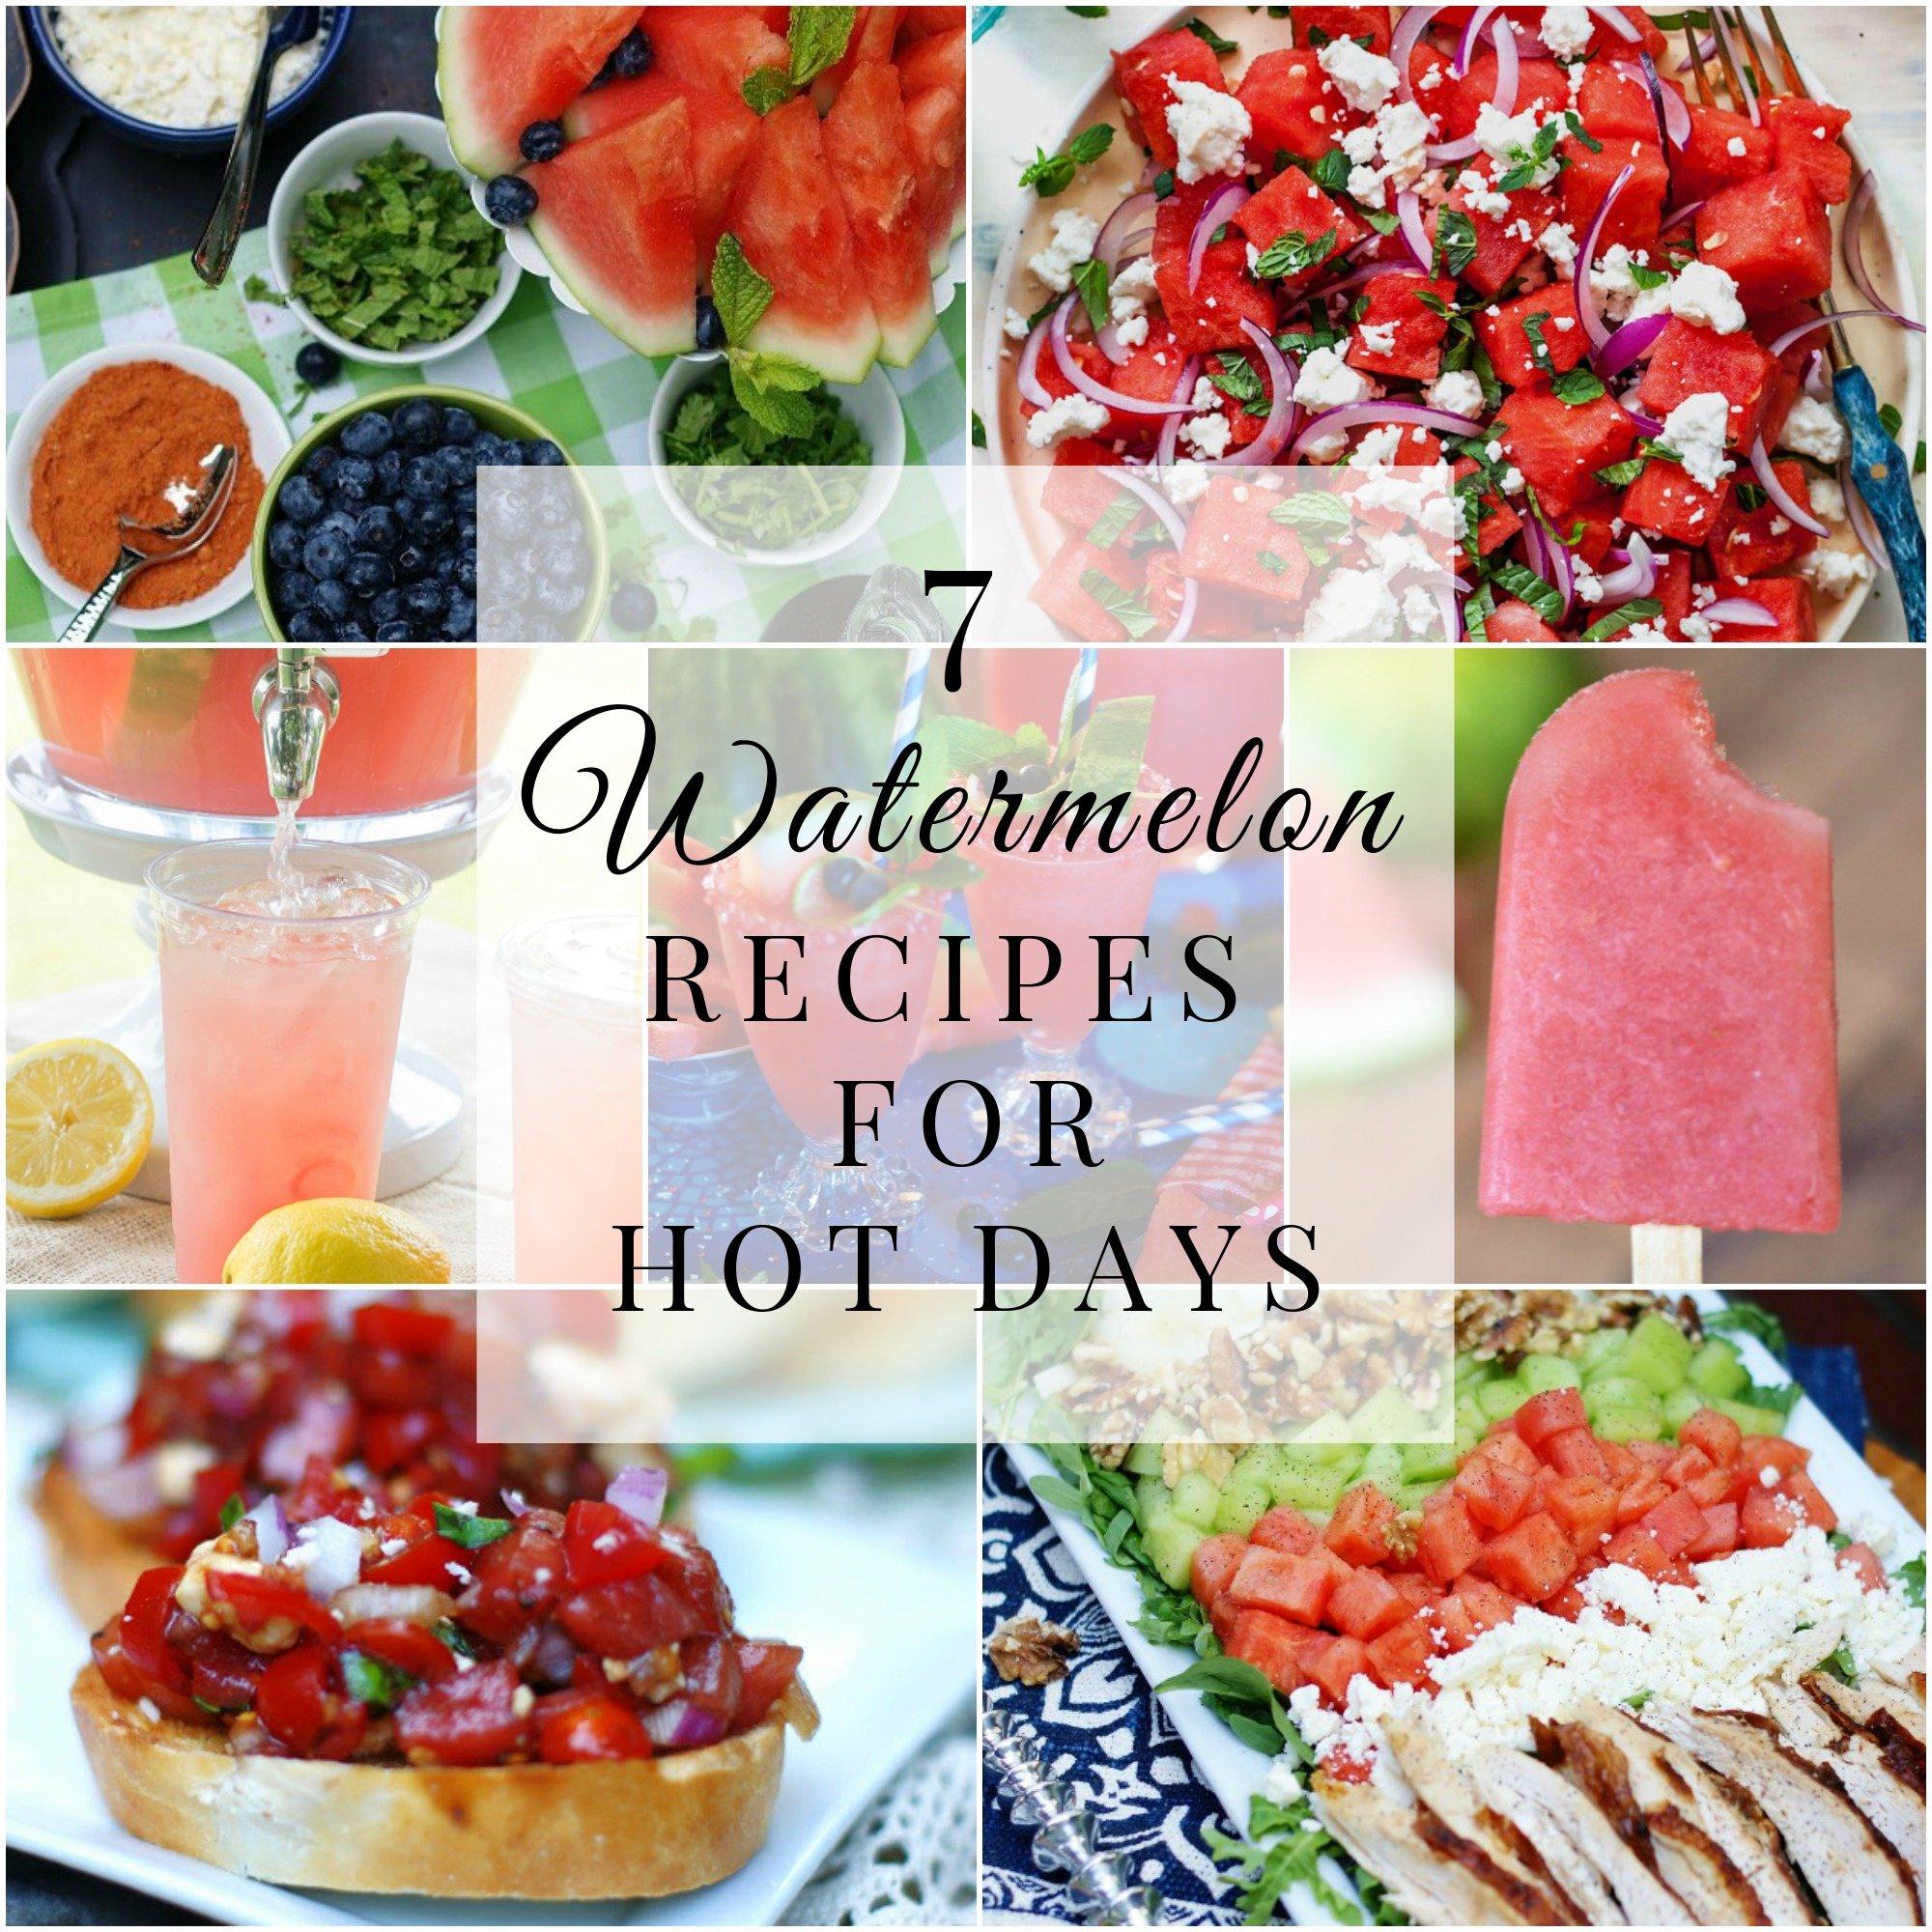 Watermelon recipes title collage